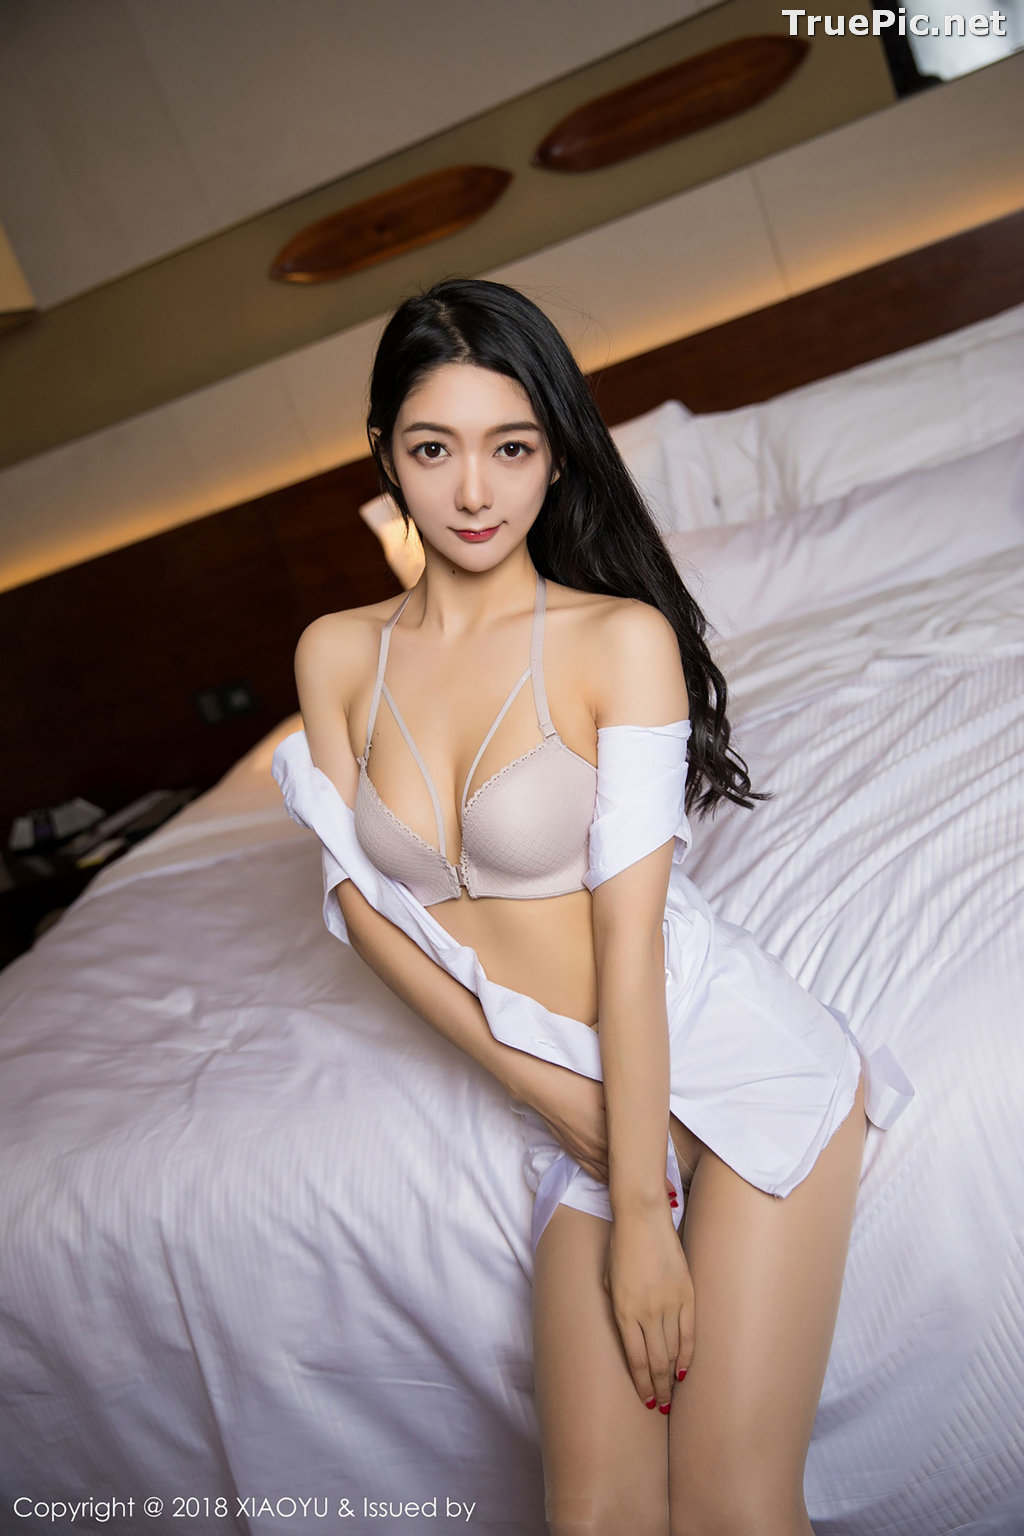 Image XiaoYu No.004 - Chinese Model - Xiao Reba (Angela喜欢猫) - White Sexy Nurse - TruePic.net - Picture-29